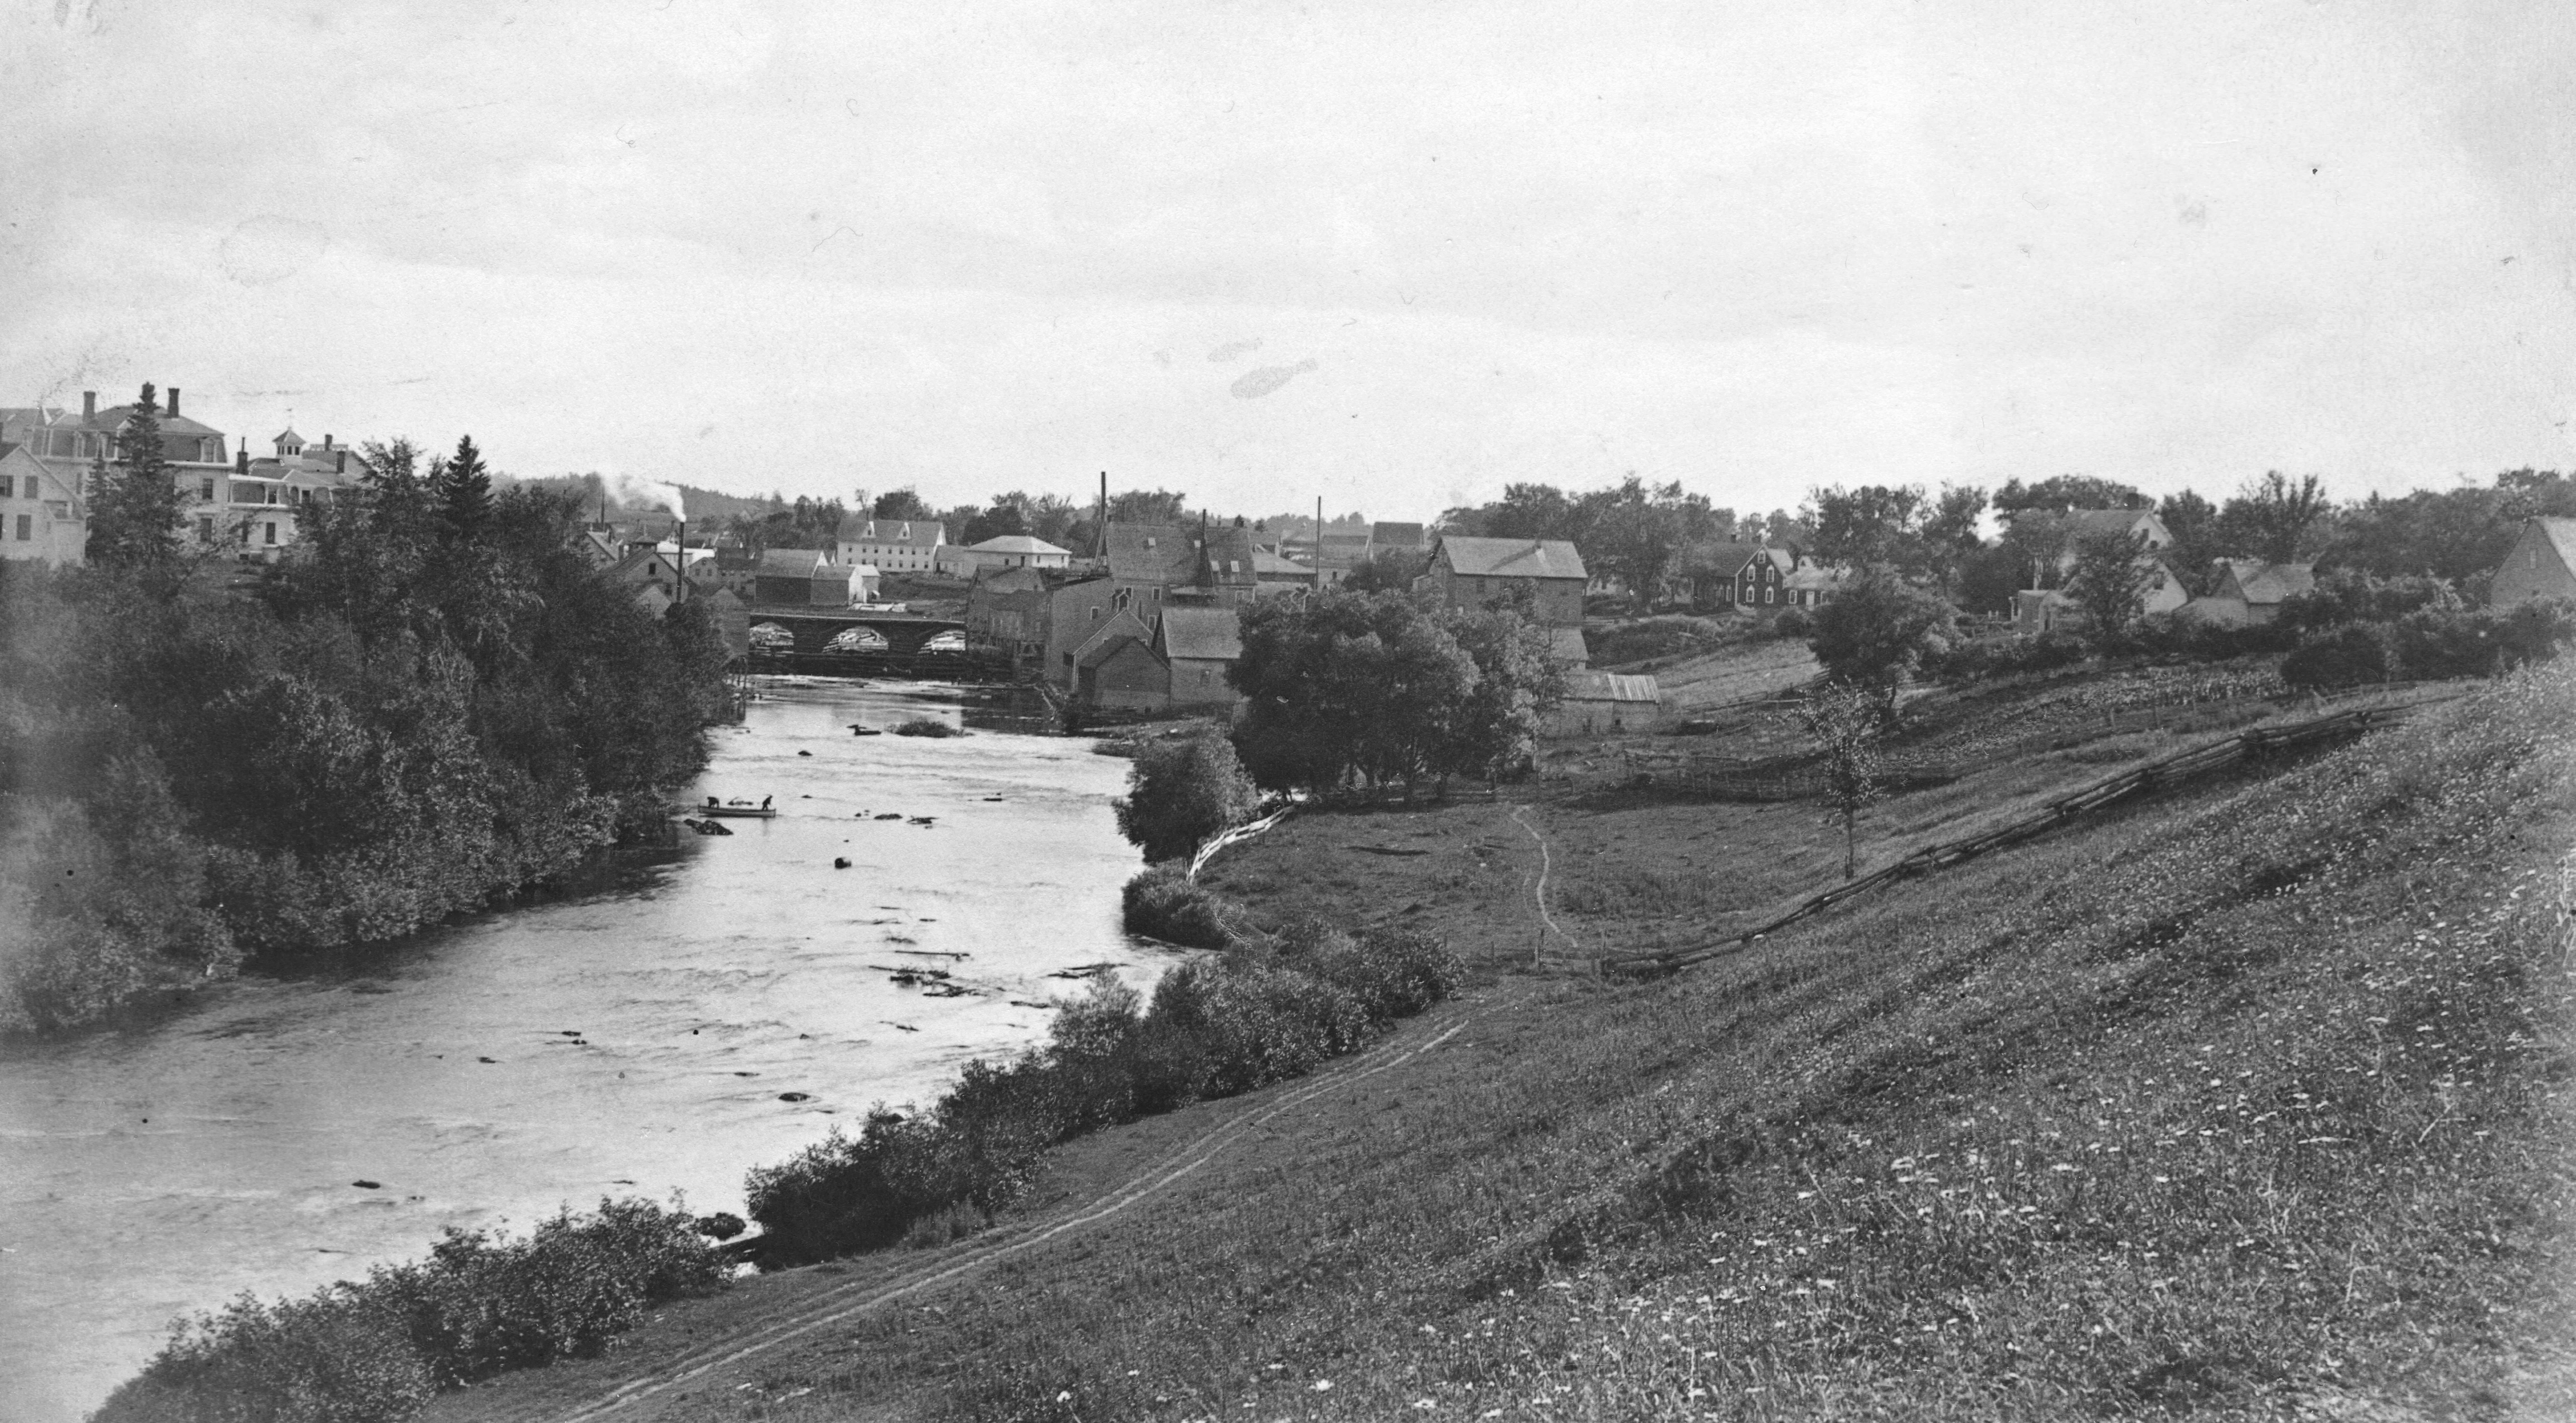 Meduxnekeag River, looking upstream.